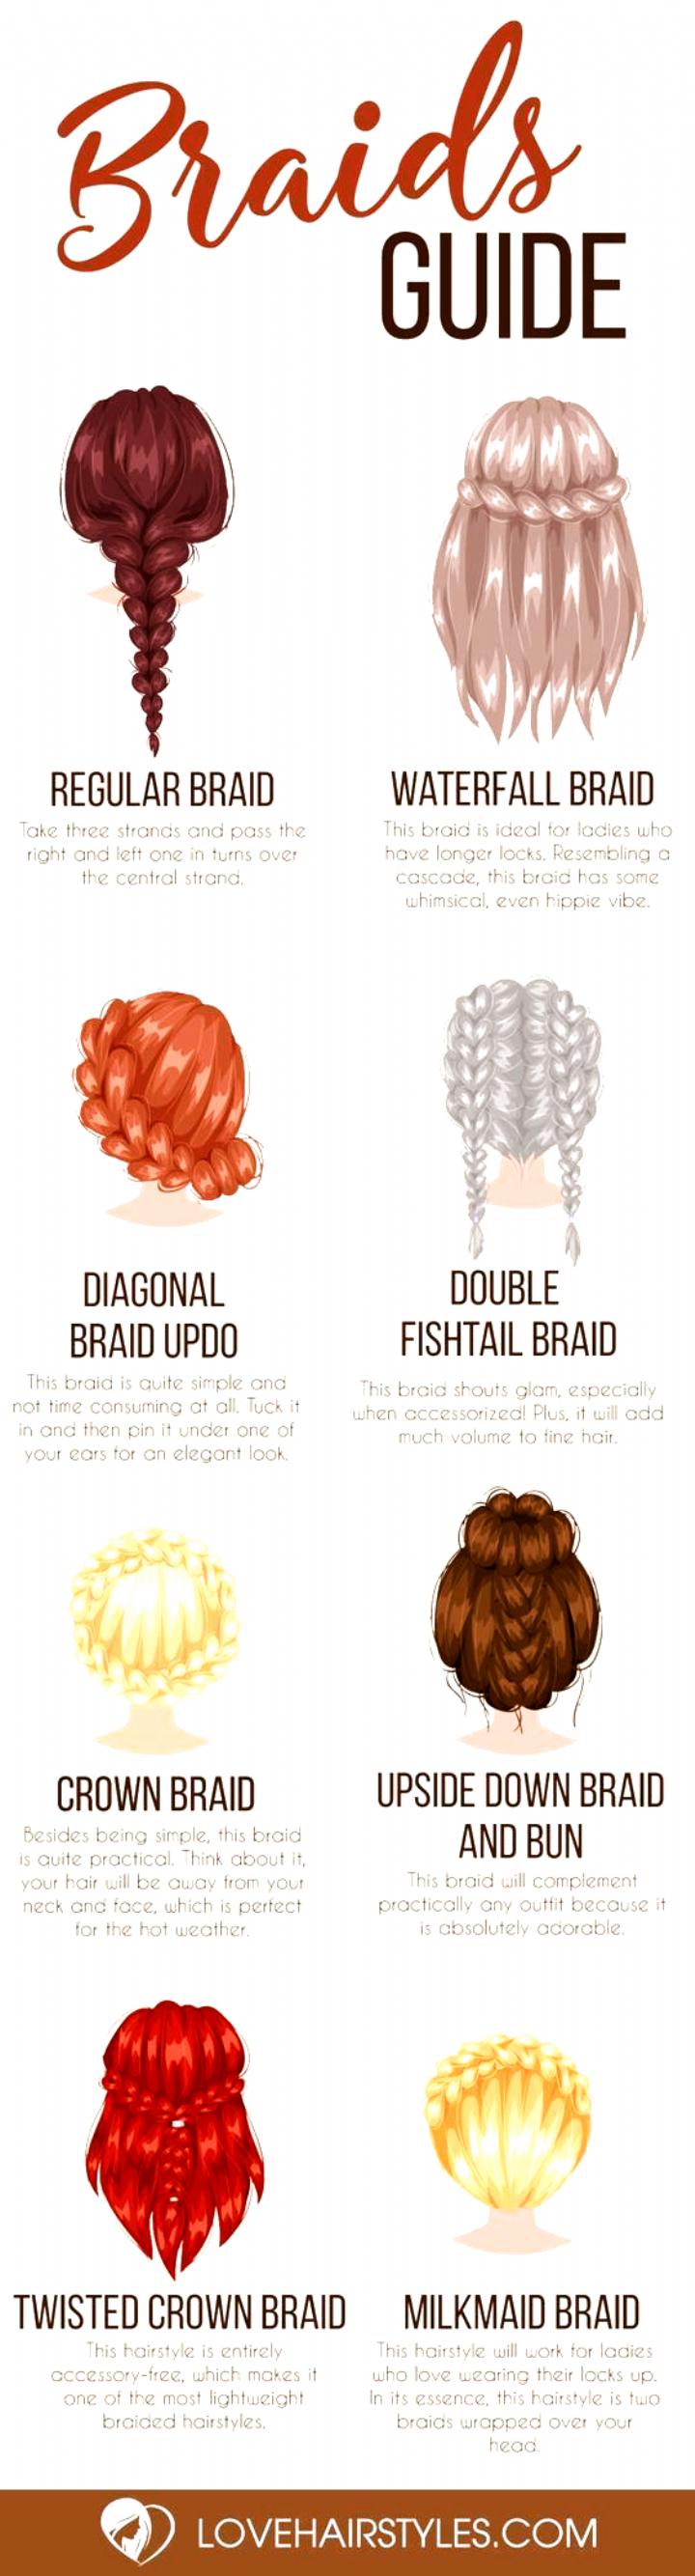 #braided hairstyles 2 braids #braided hairstyles indian #braided hairstyles.com #braid hairstyles mo